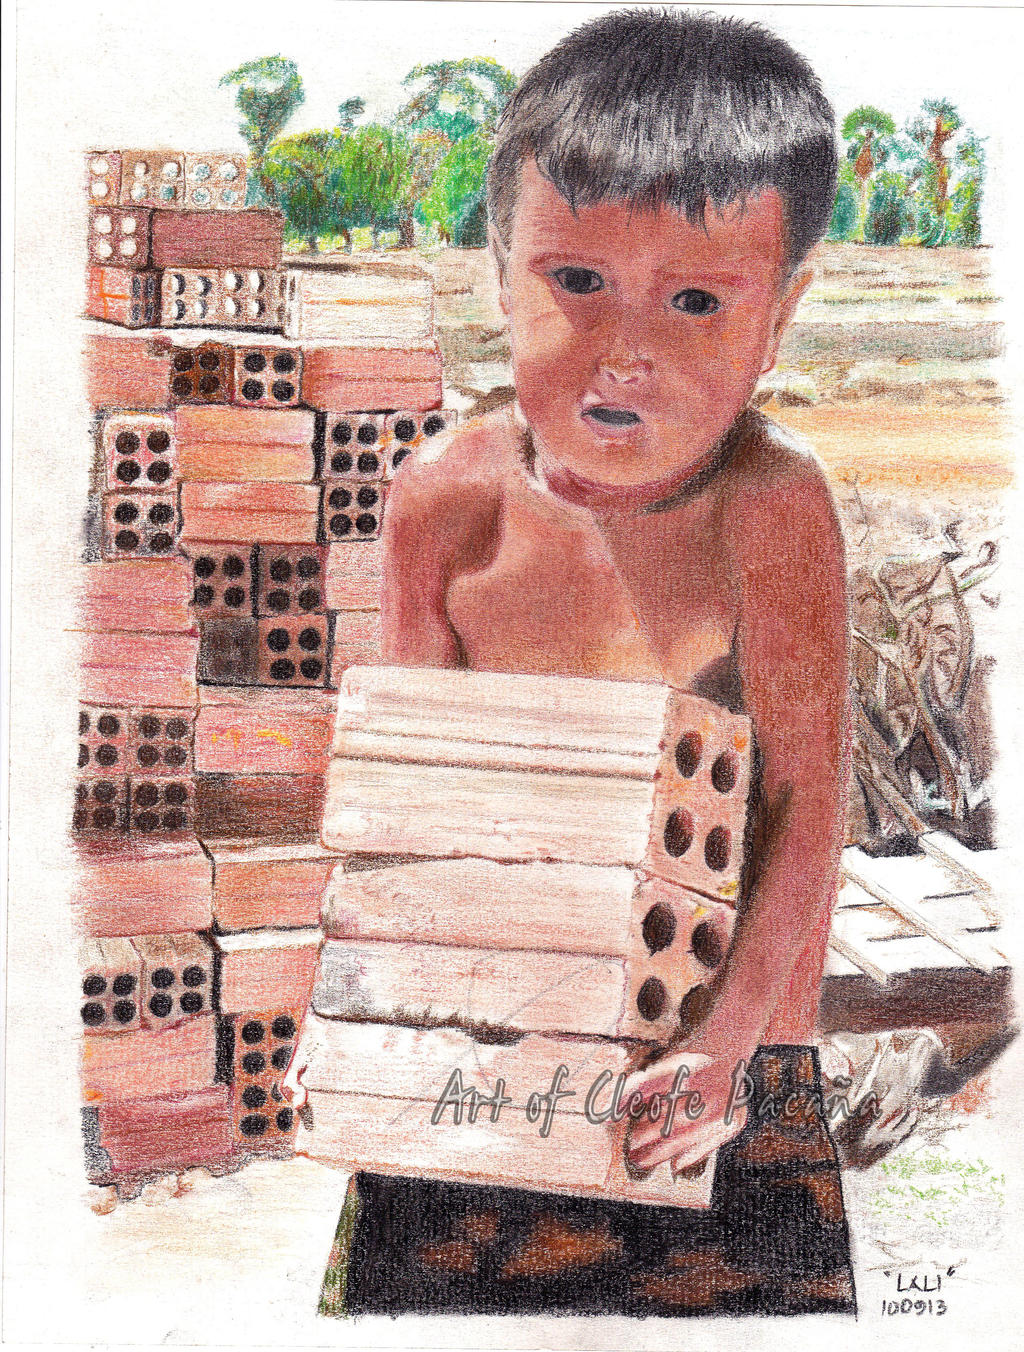 Child Labor by cLoELaLi11 on deviantART